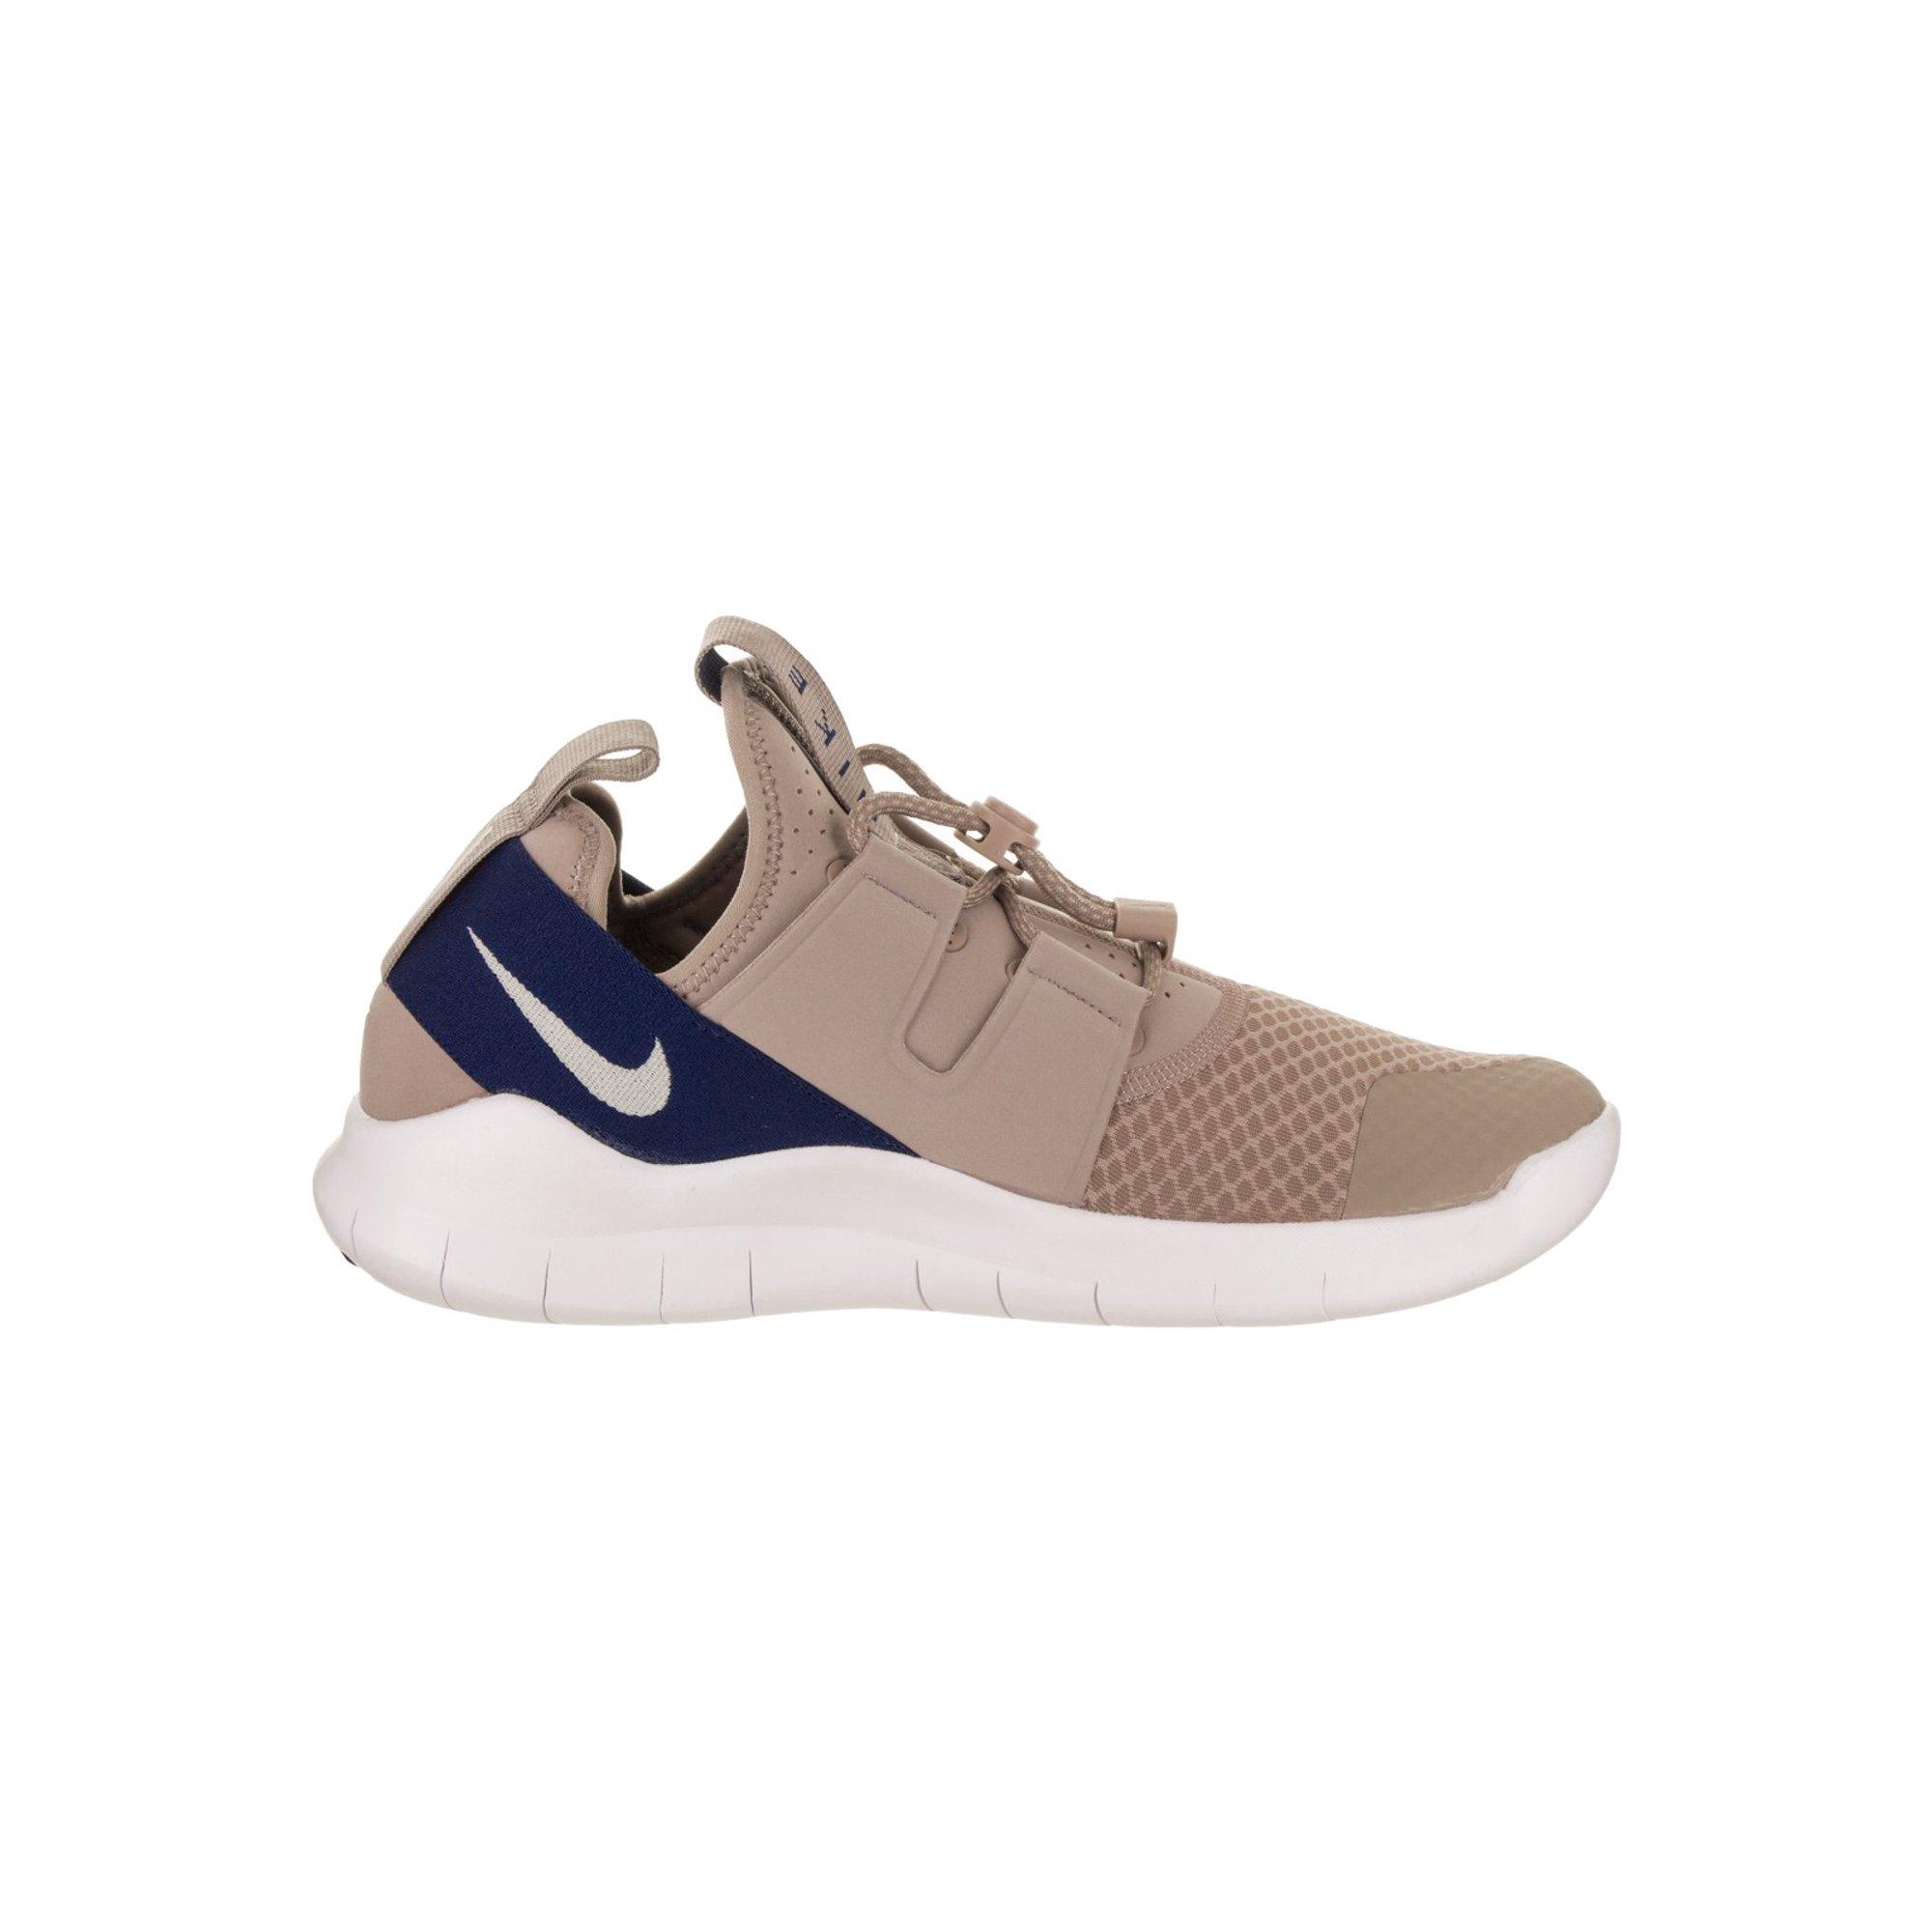 Nike Men's Cmtr Free Rn Running Shoe 2018 1lKc3uFTJ